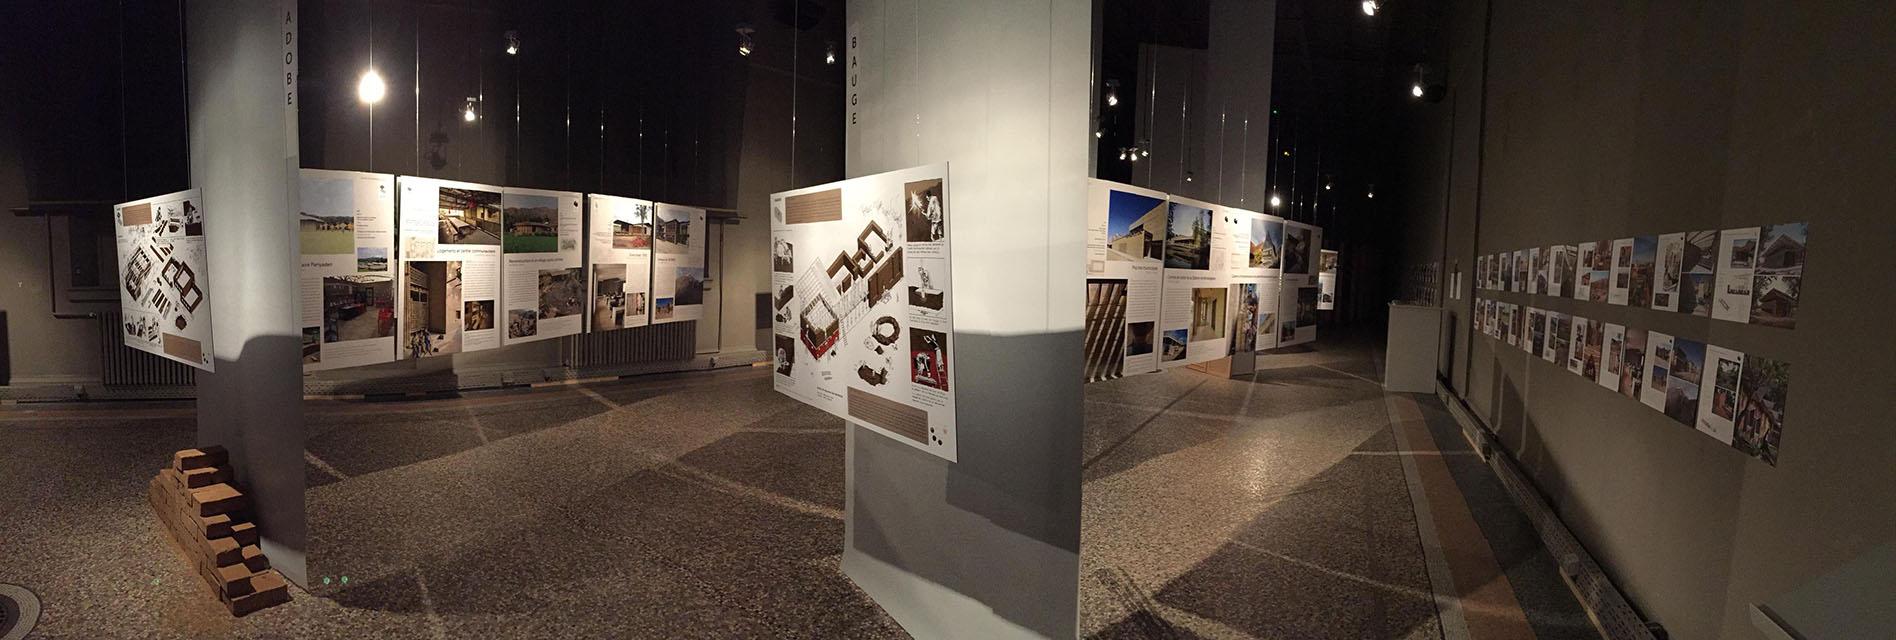 EXPO Architecture en terre